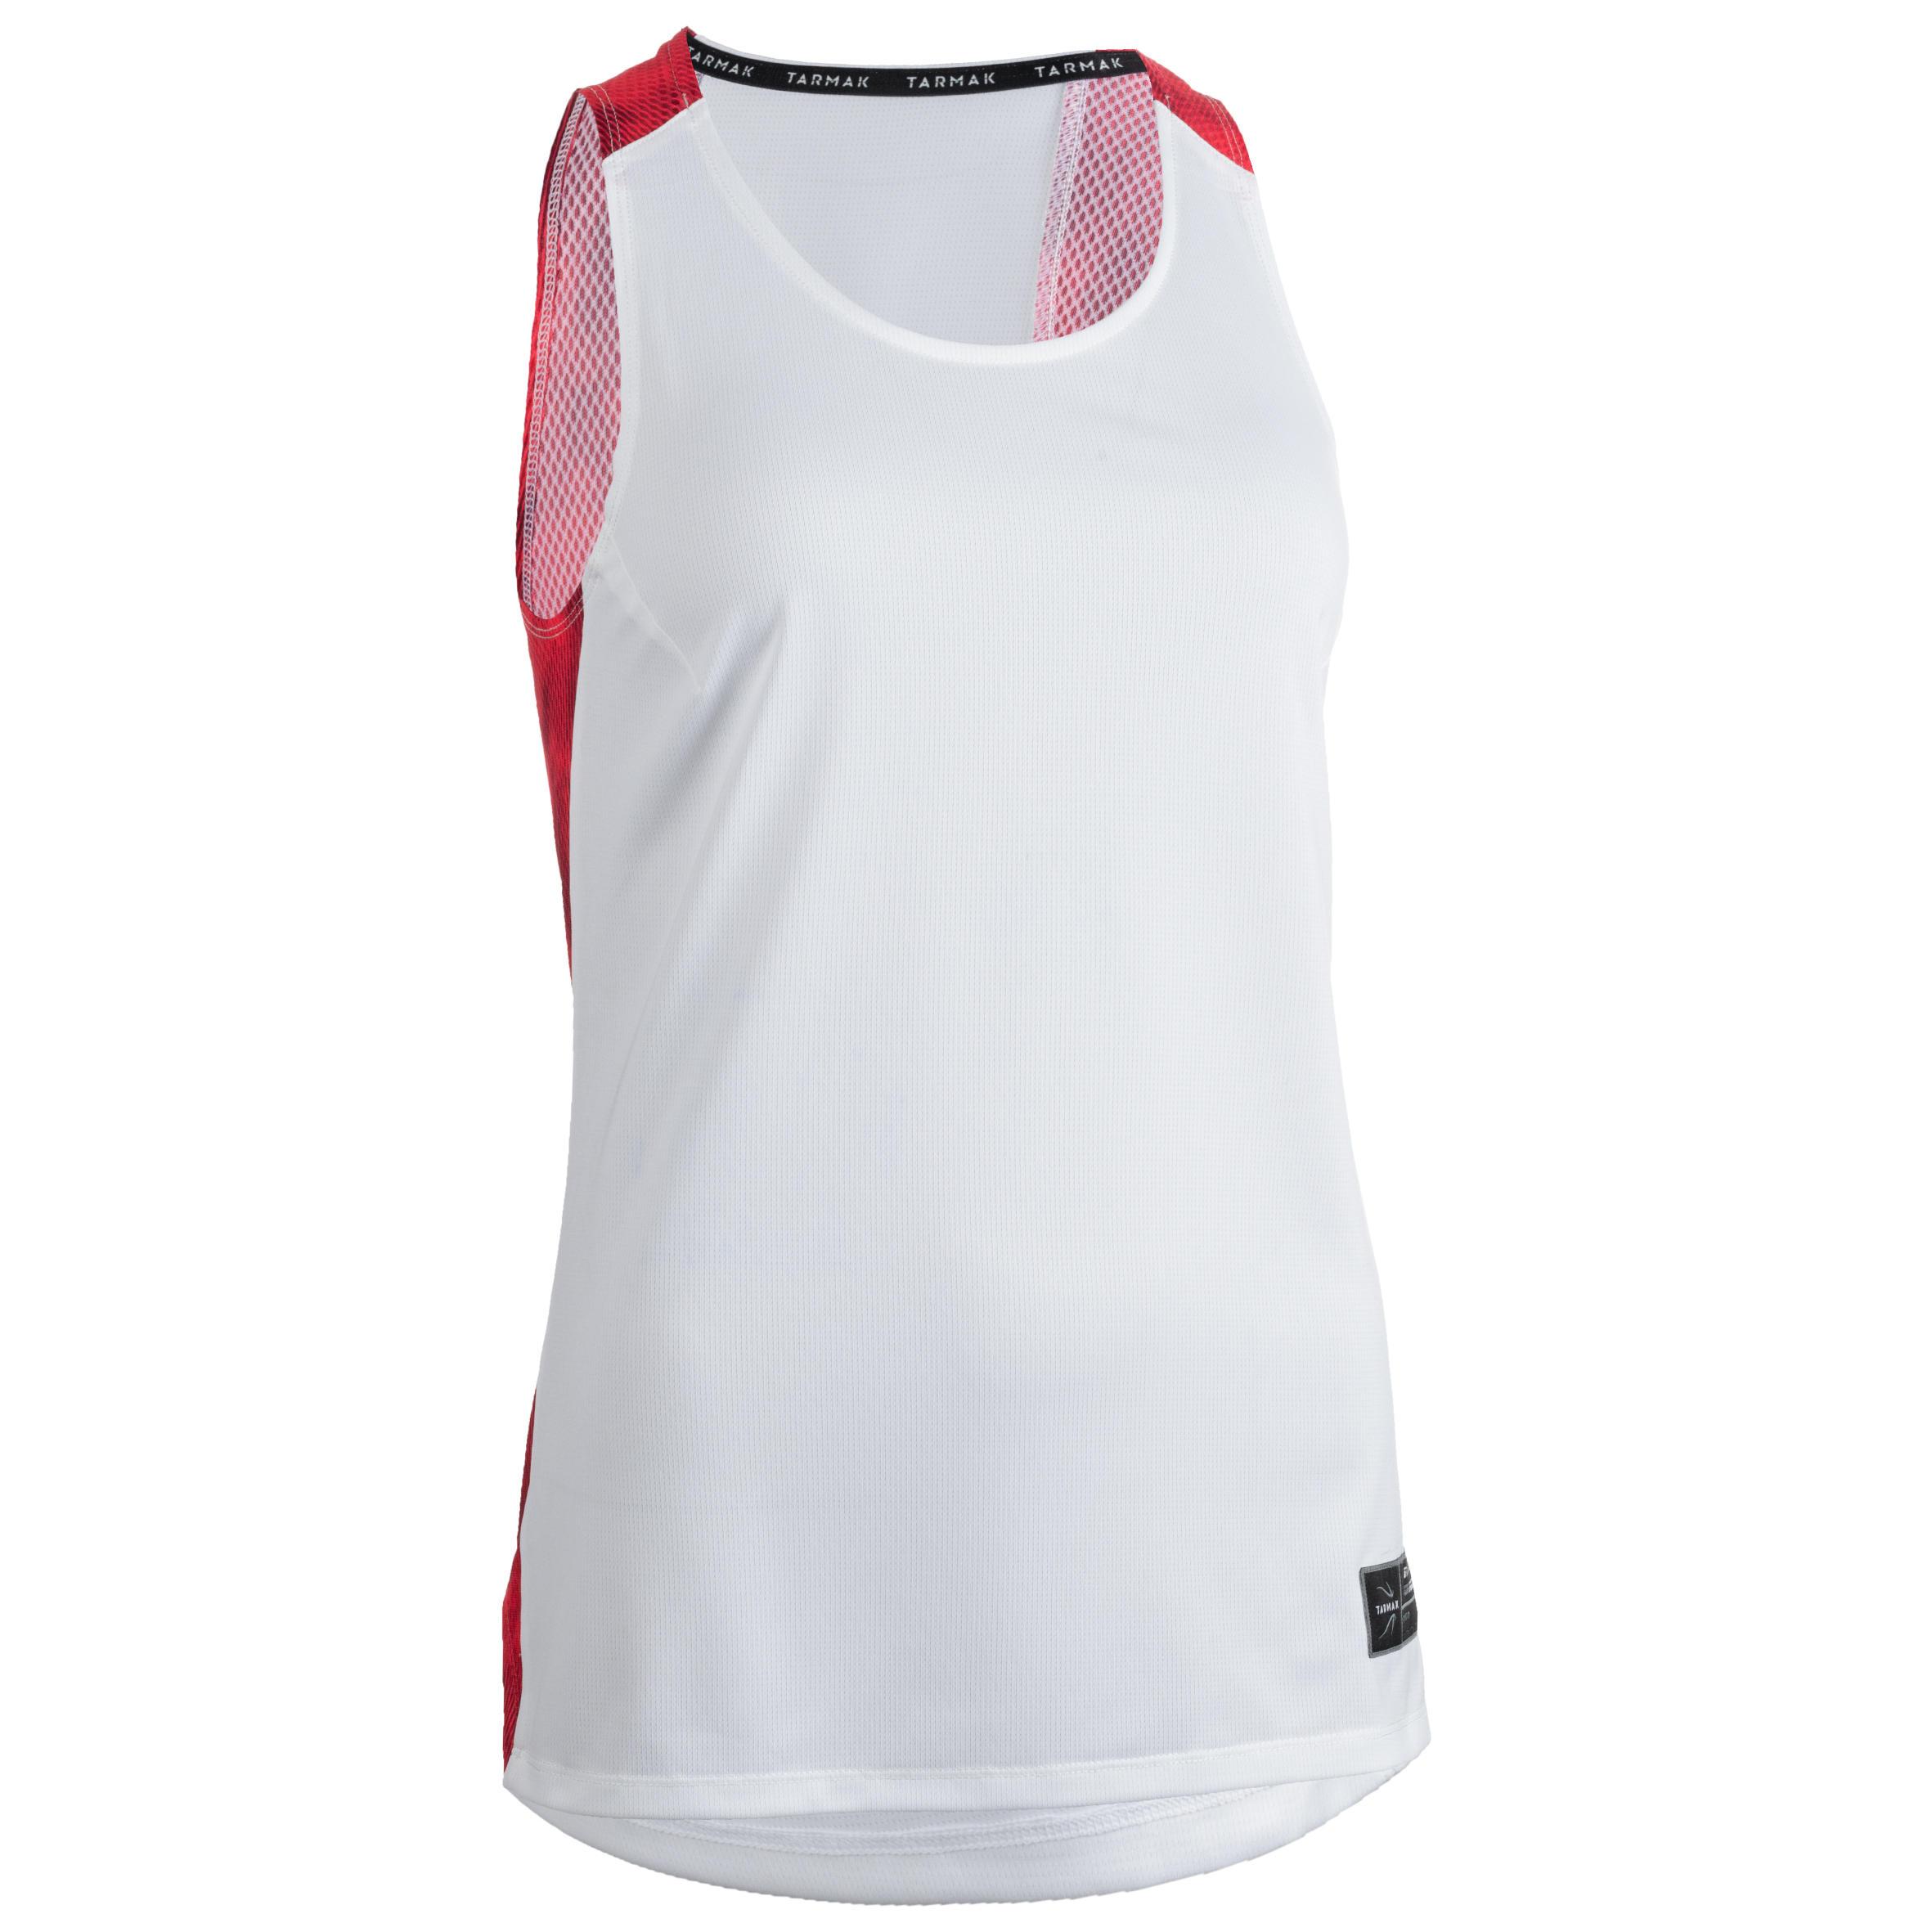 Tarmak Basketbalshirt T500 wit/roze (dames)